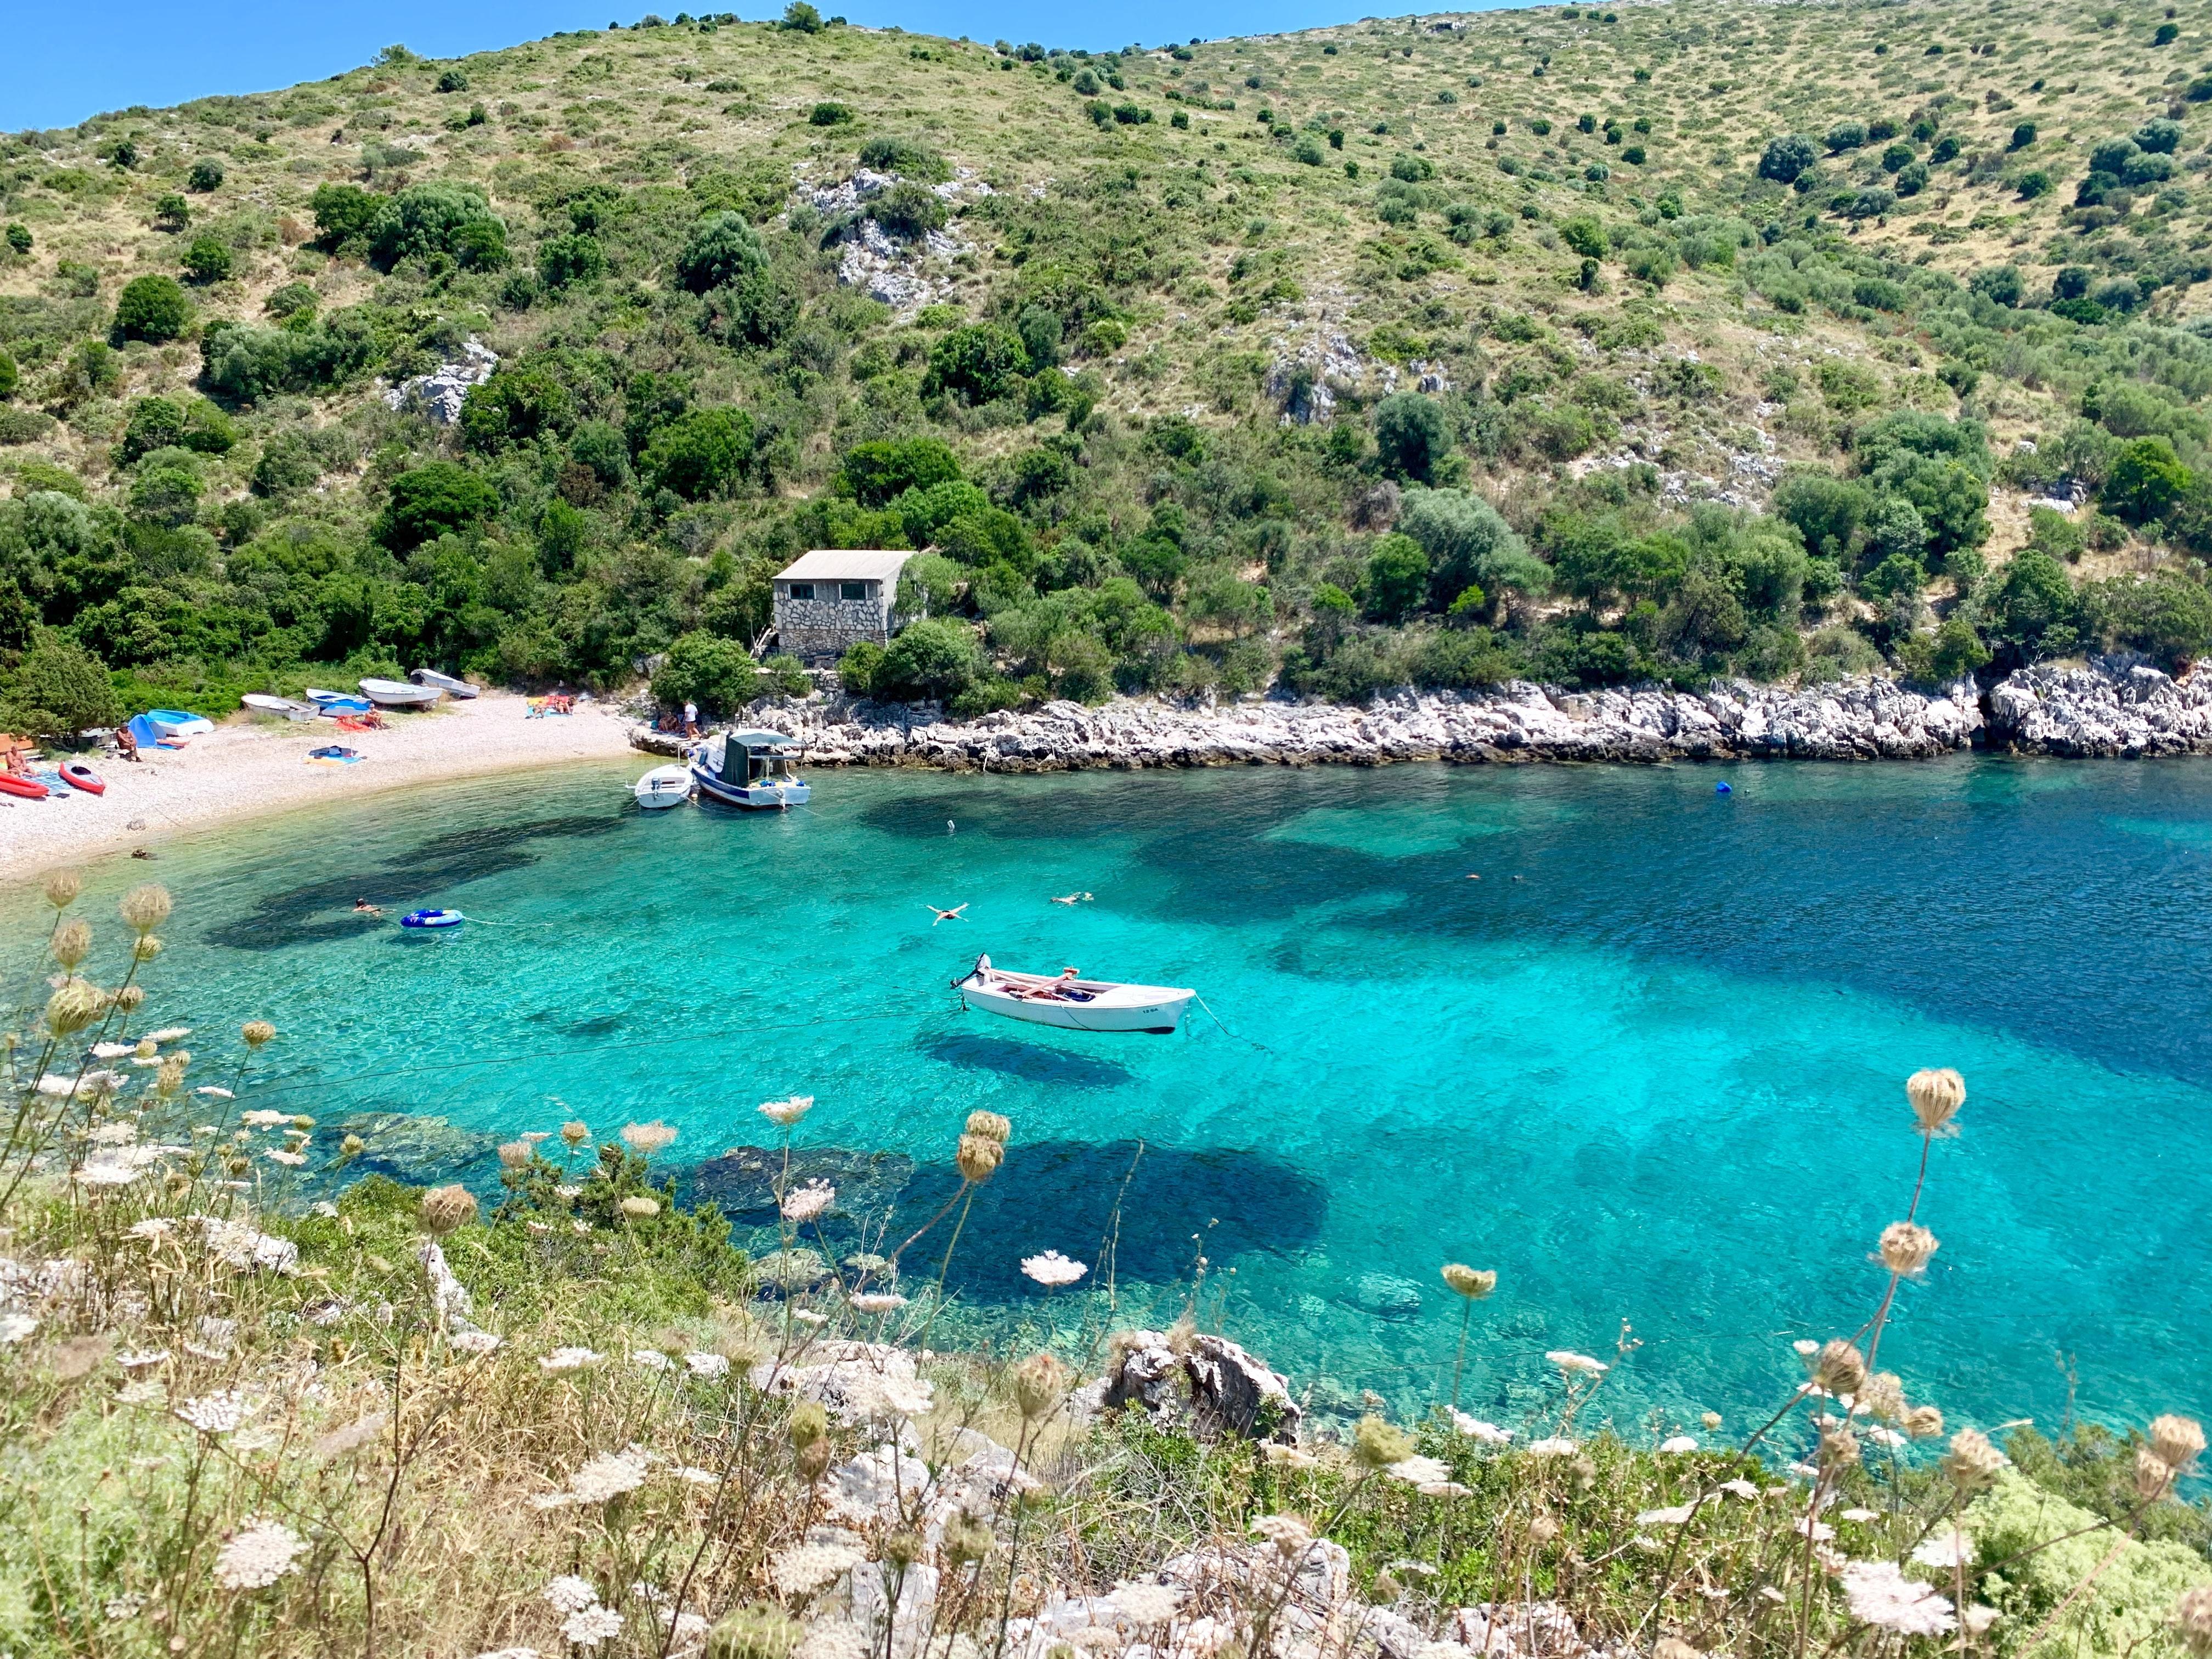 One Day Trip At Zadar Archipelago, Dugi Otok, Croatia